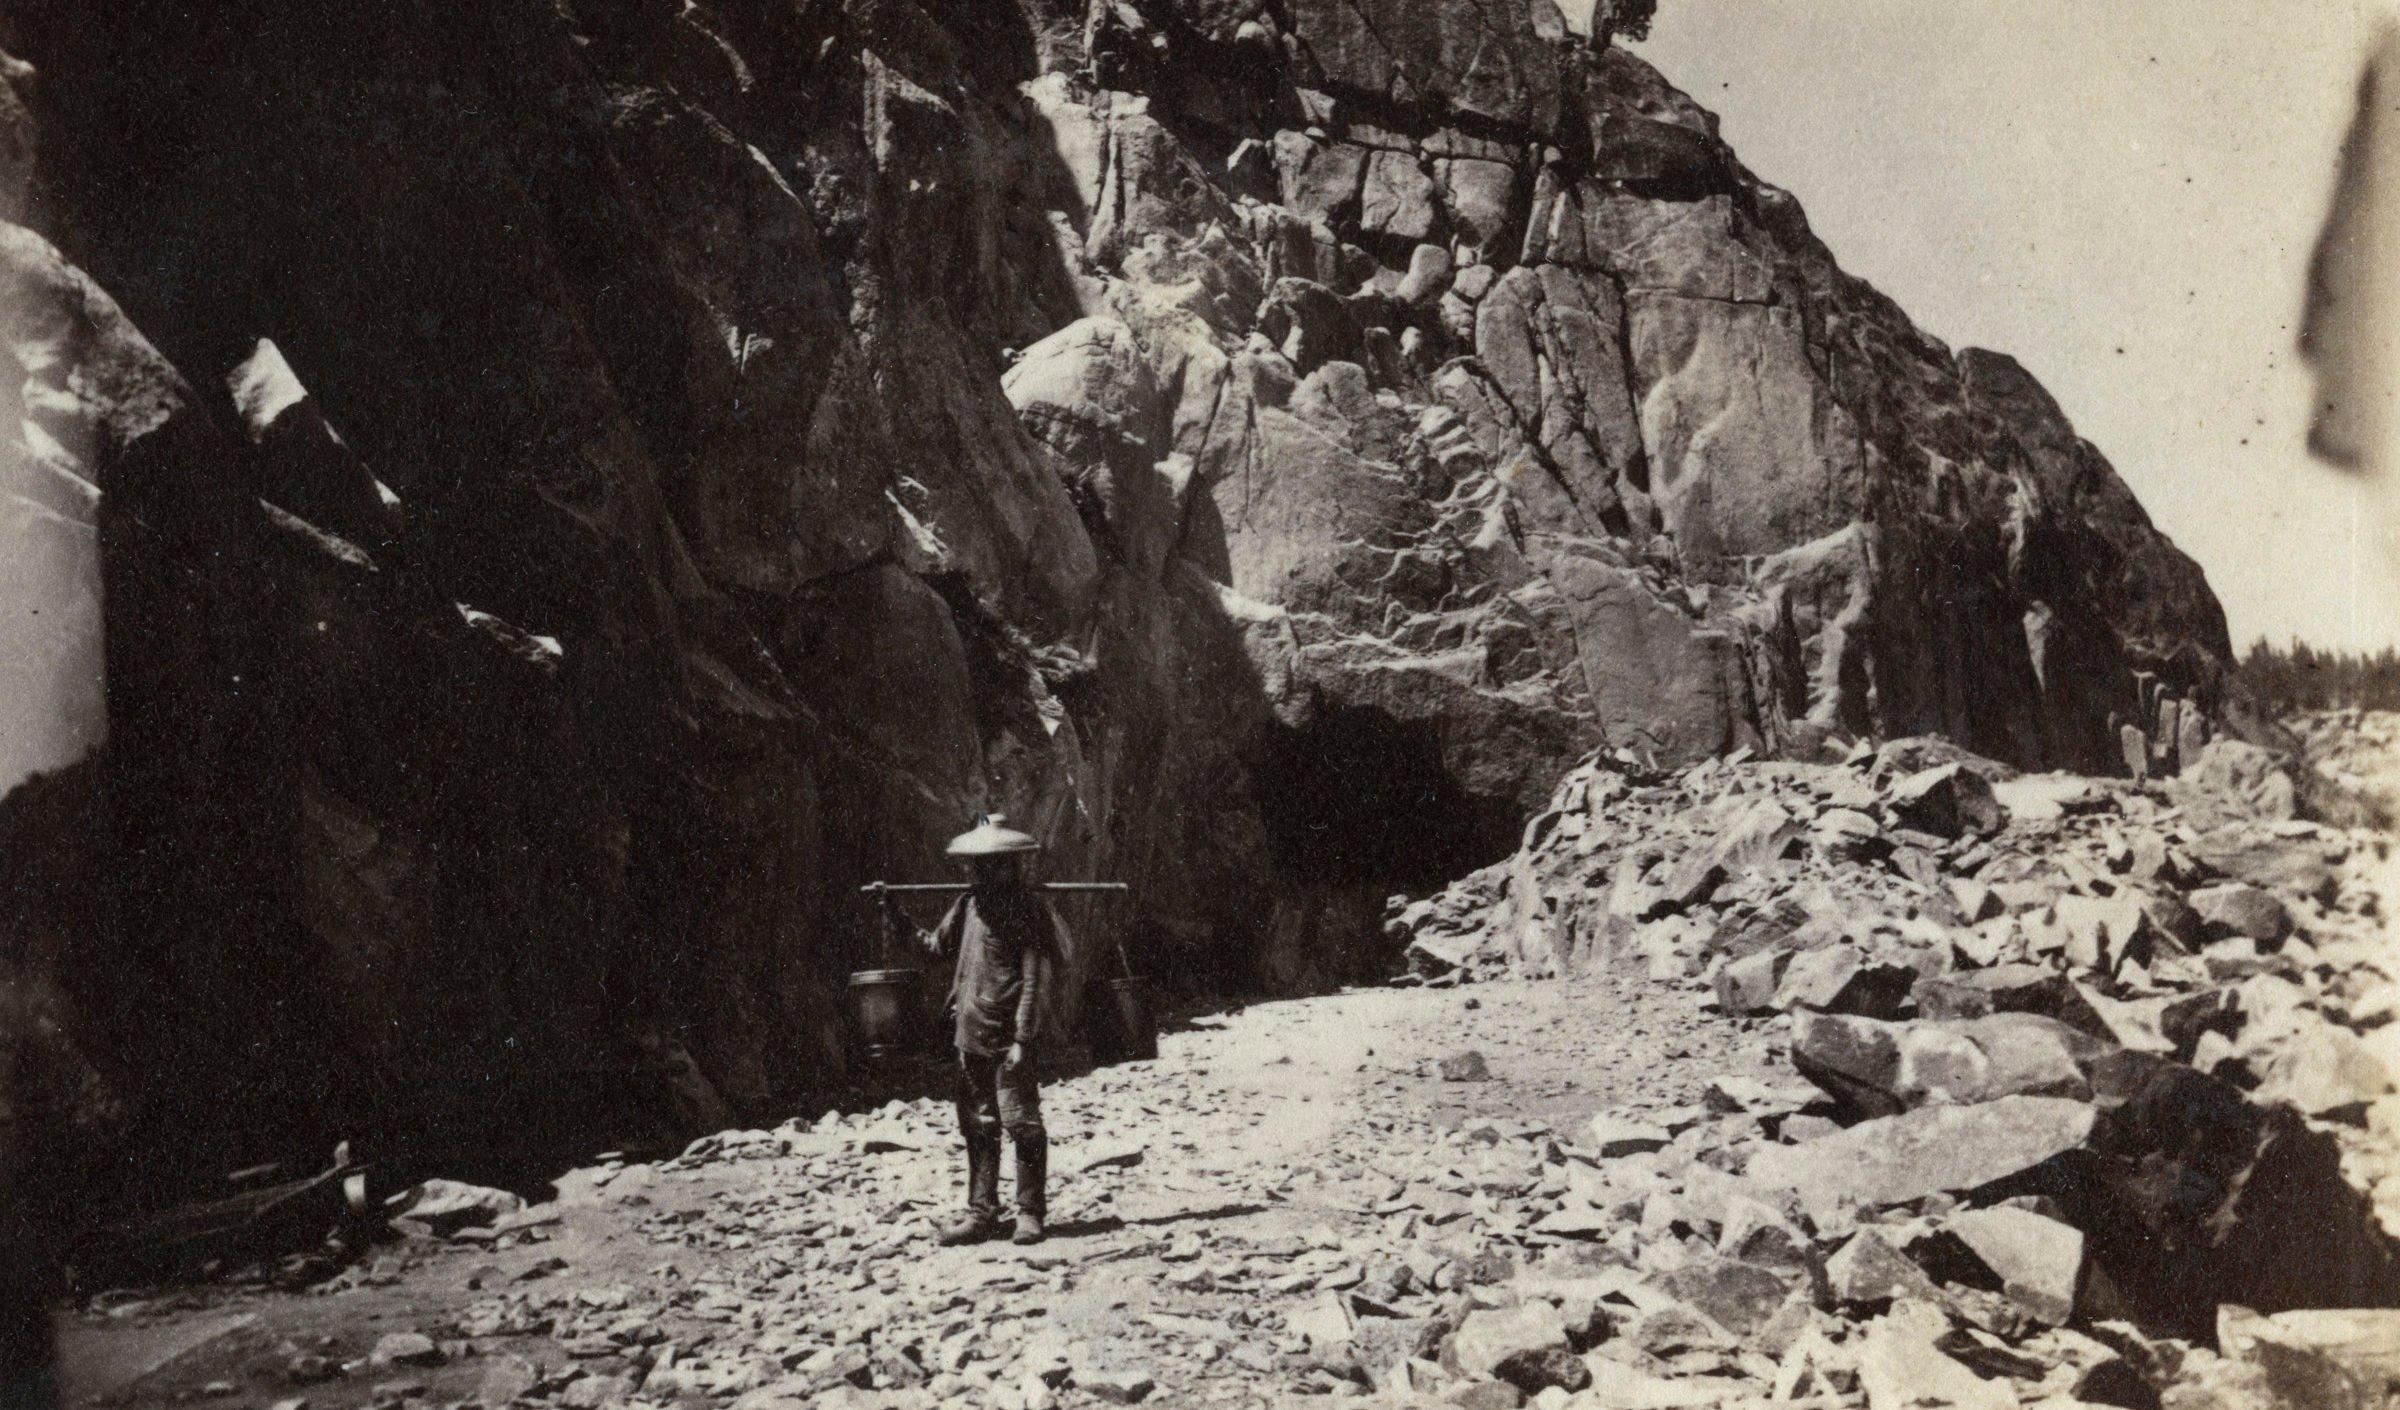 The in railroad 1800s workers Railroads in